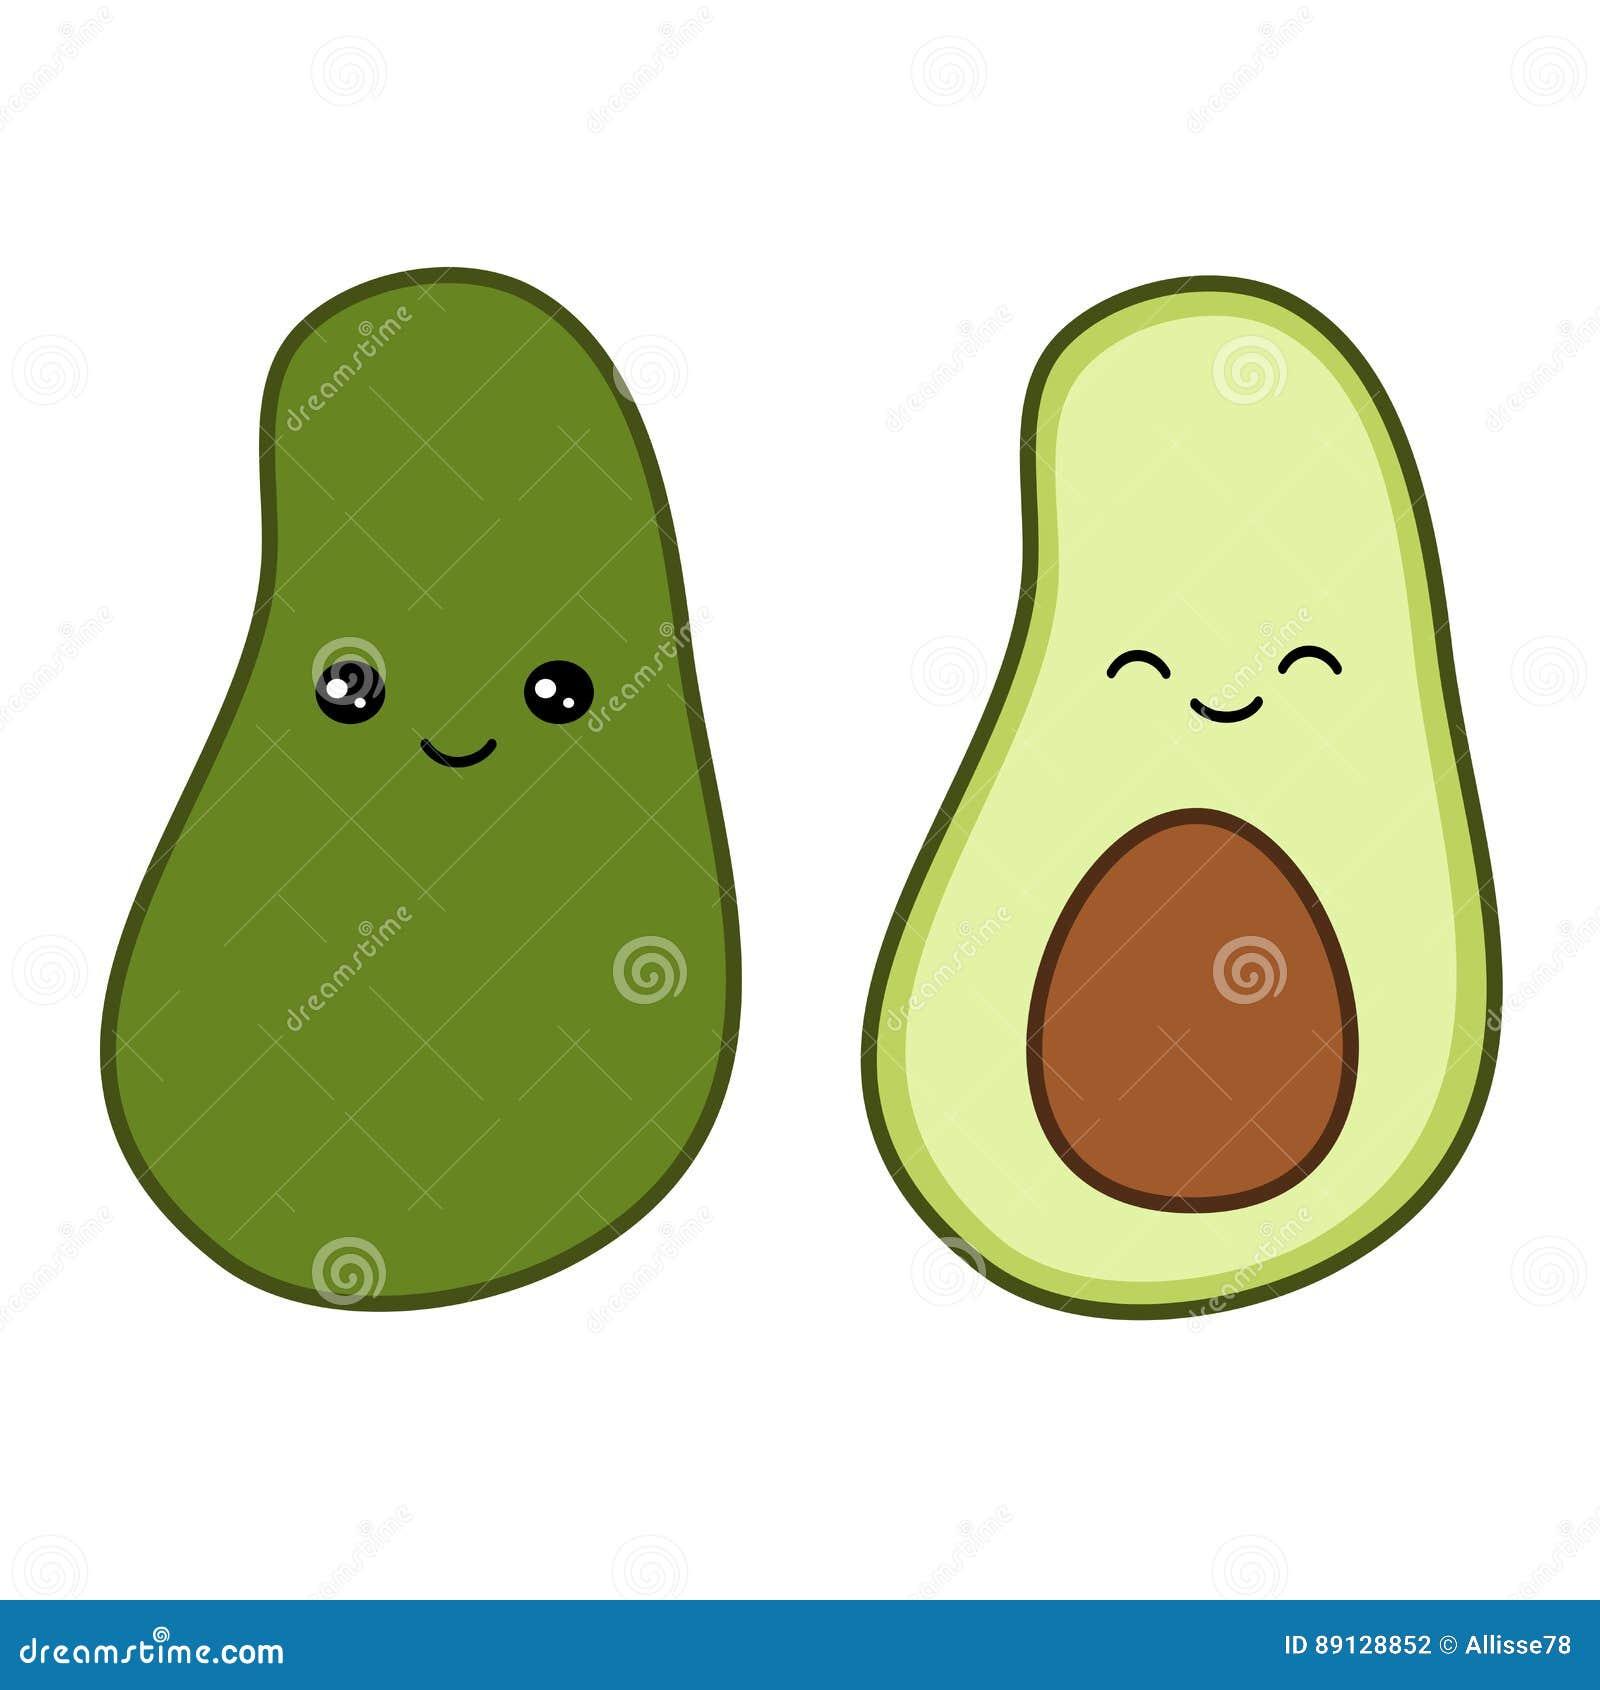 Cute Cartoon Avocado Illustration Isolated On White